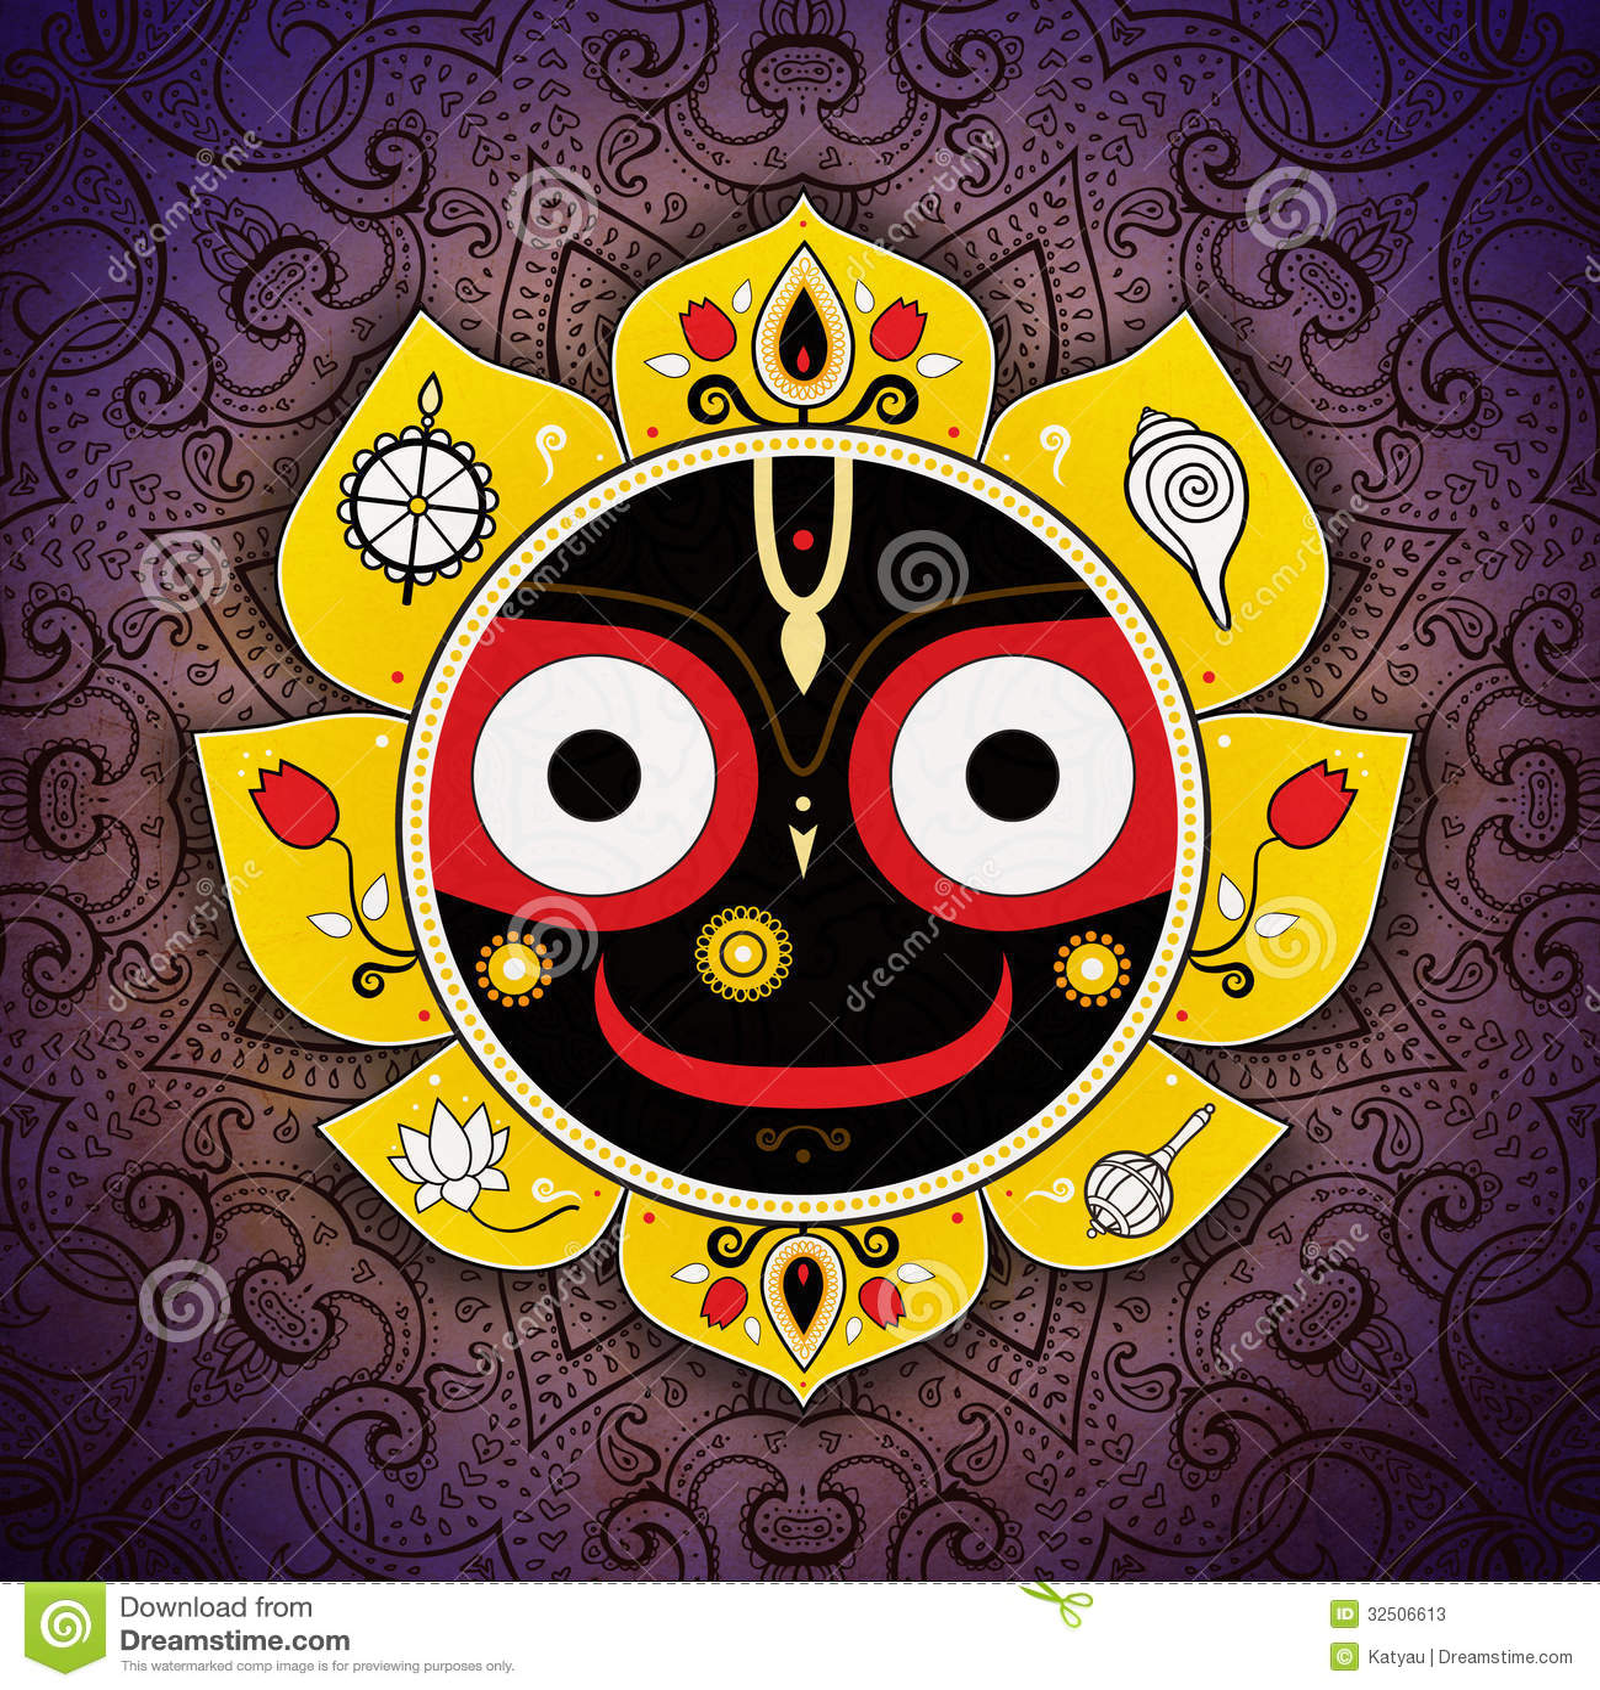 Most Inspiring Wallpaper Lord Jagannath Puri - jagannath-indian-god-universe-lord-jagannatha-32506613  Photograph_282741.jpg